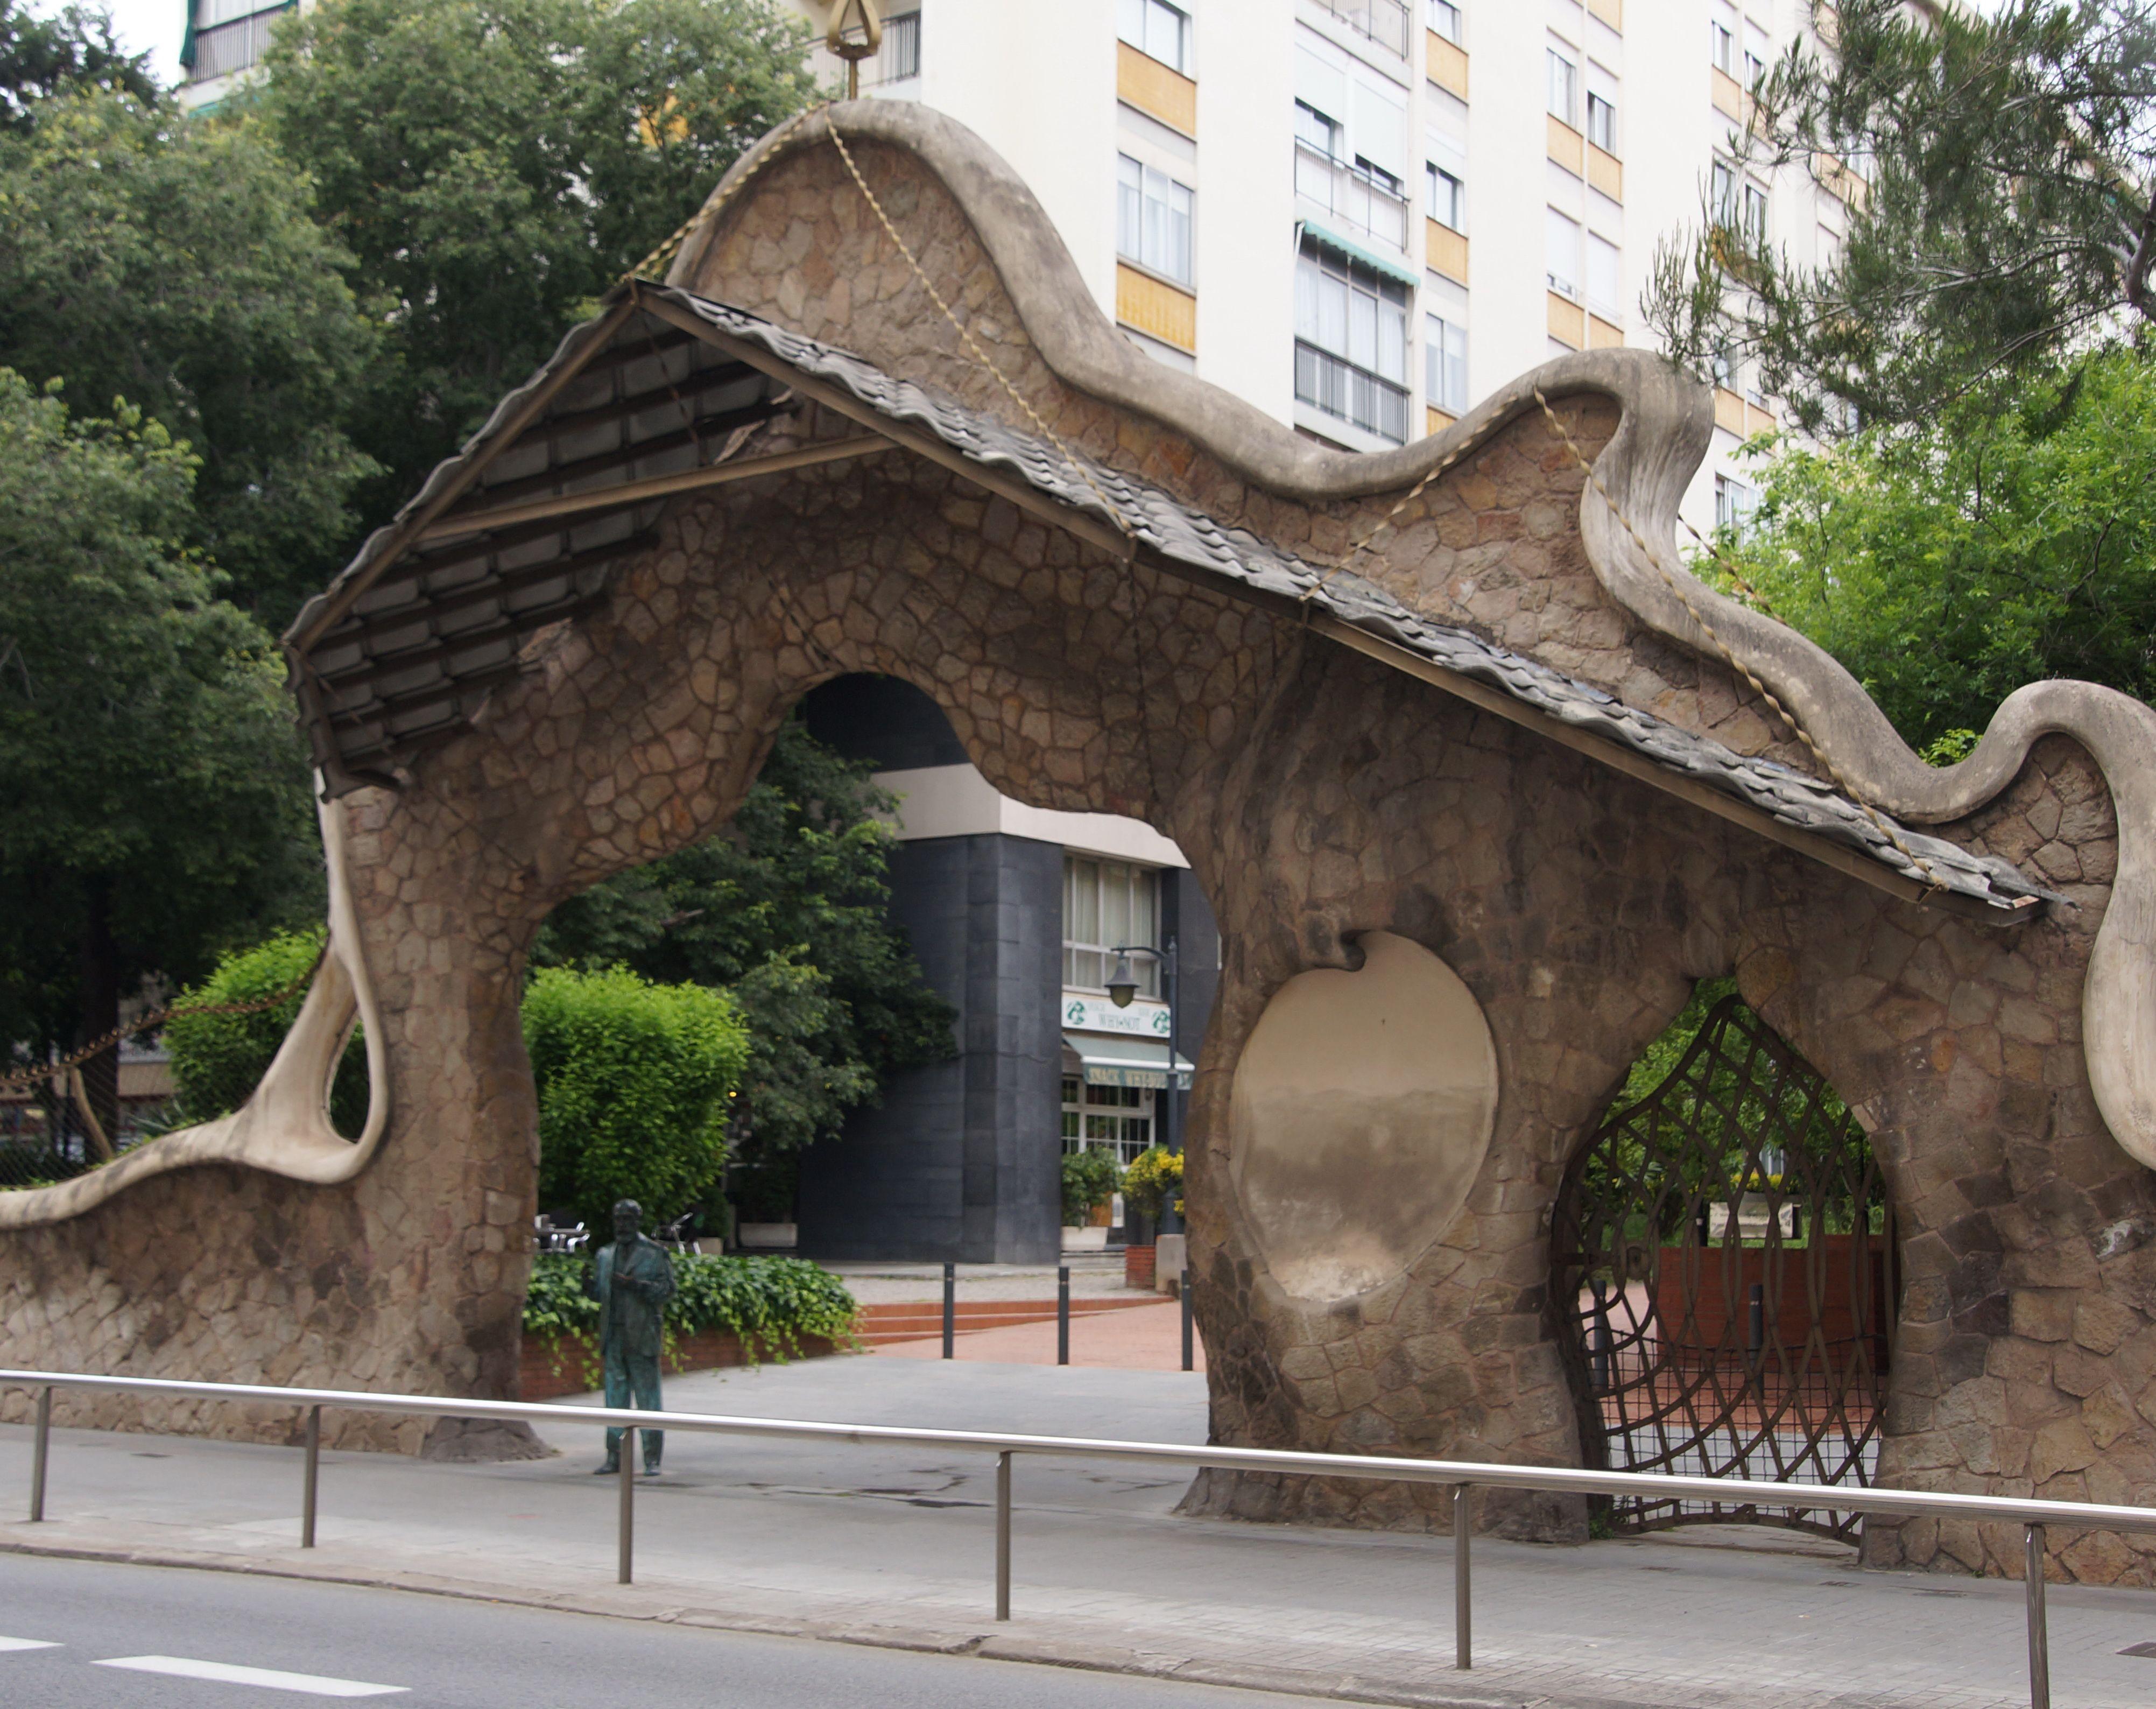 The Finca Miralles entrance, now public art in Barcelona, by Antoni Gaudí